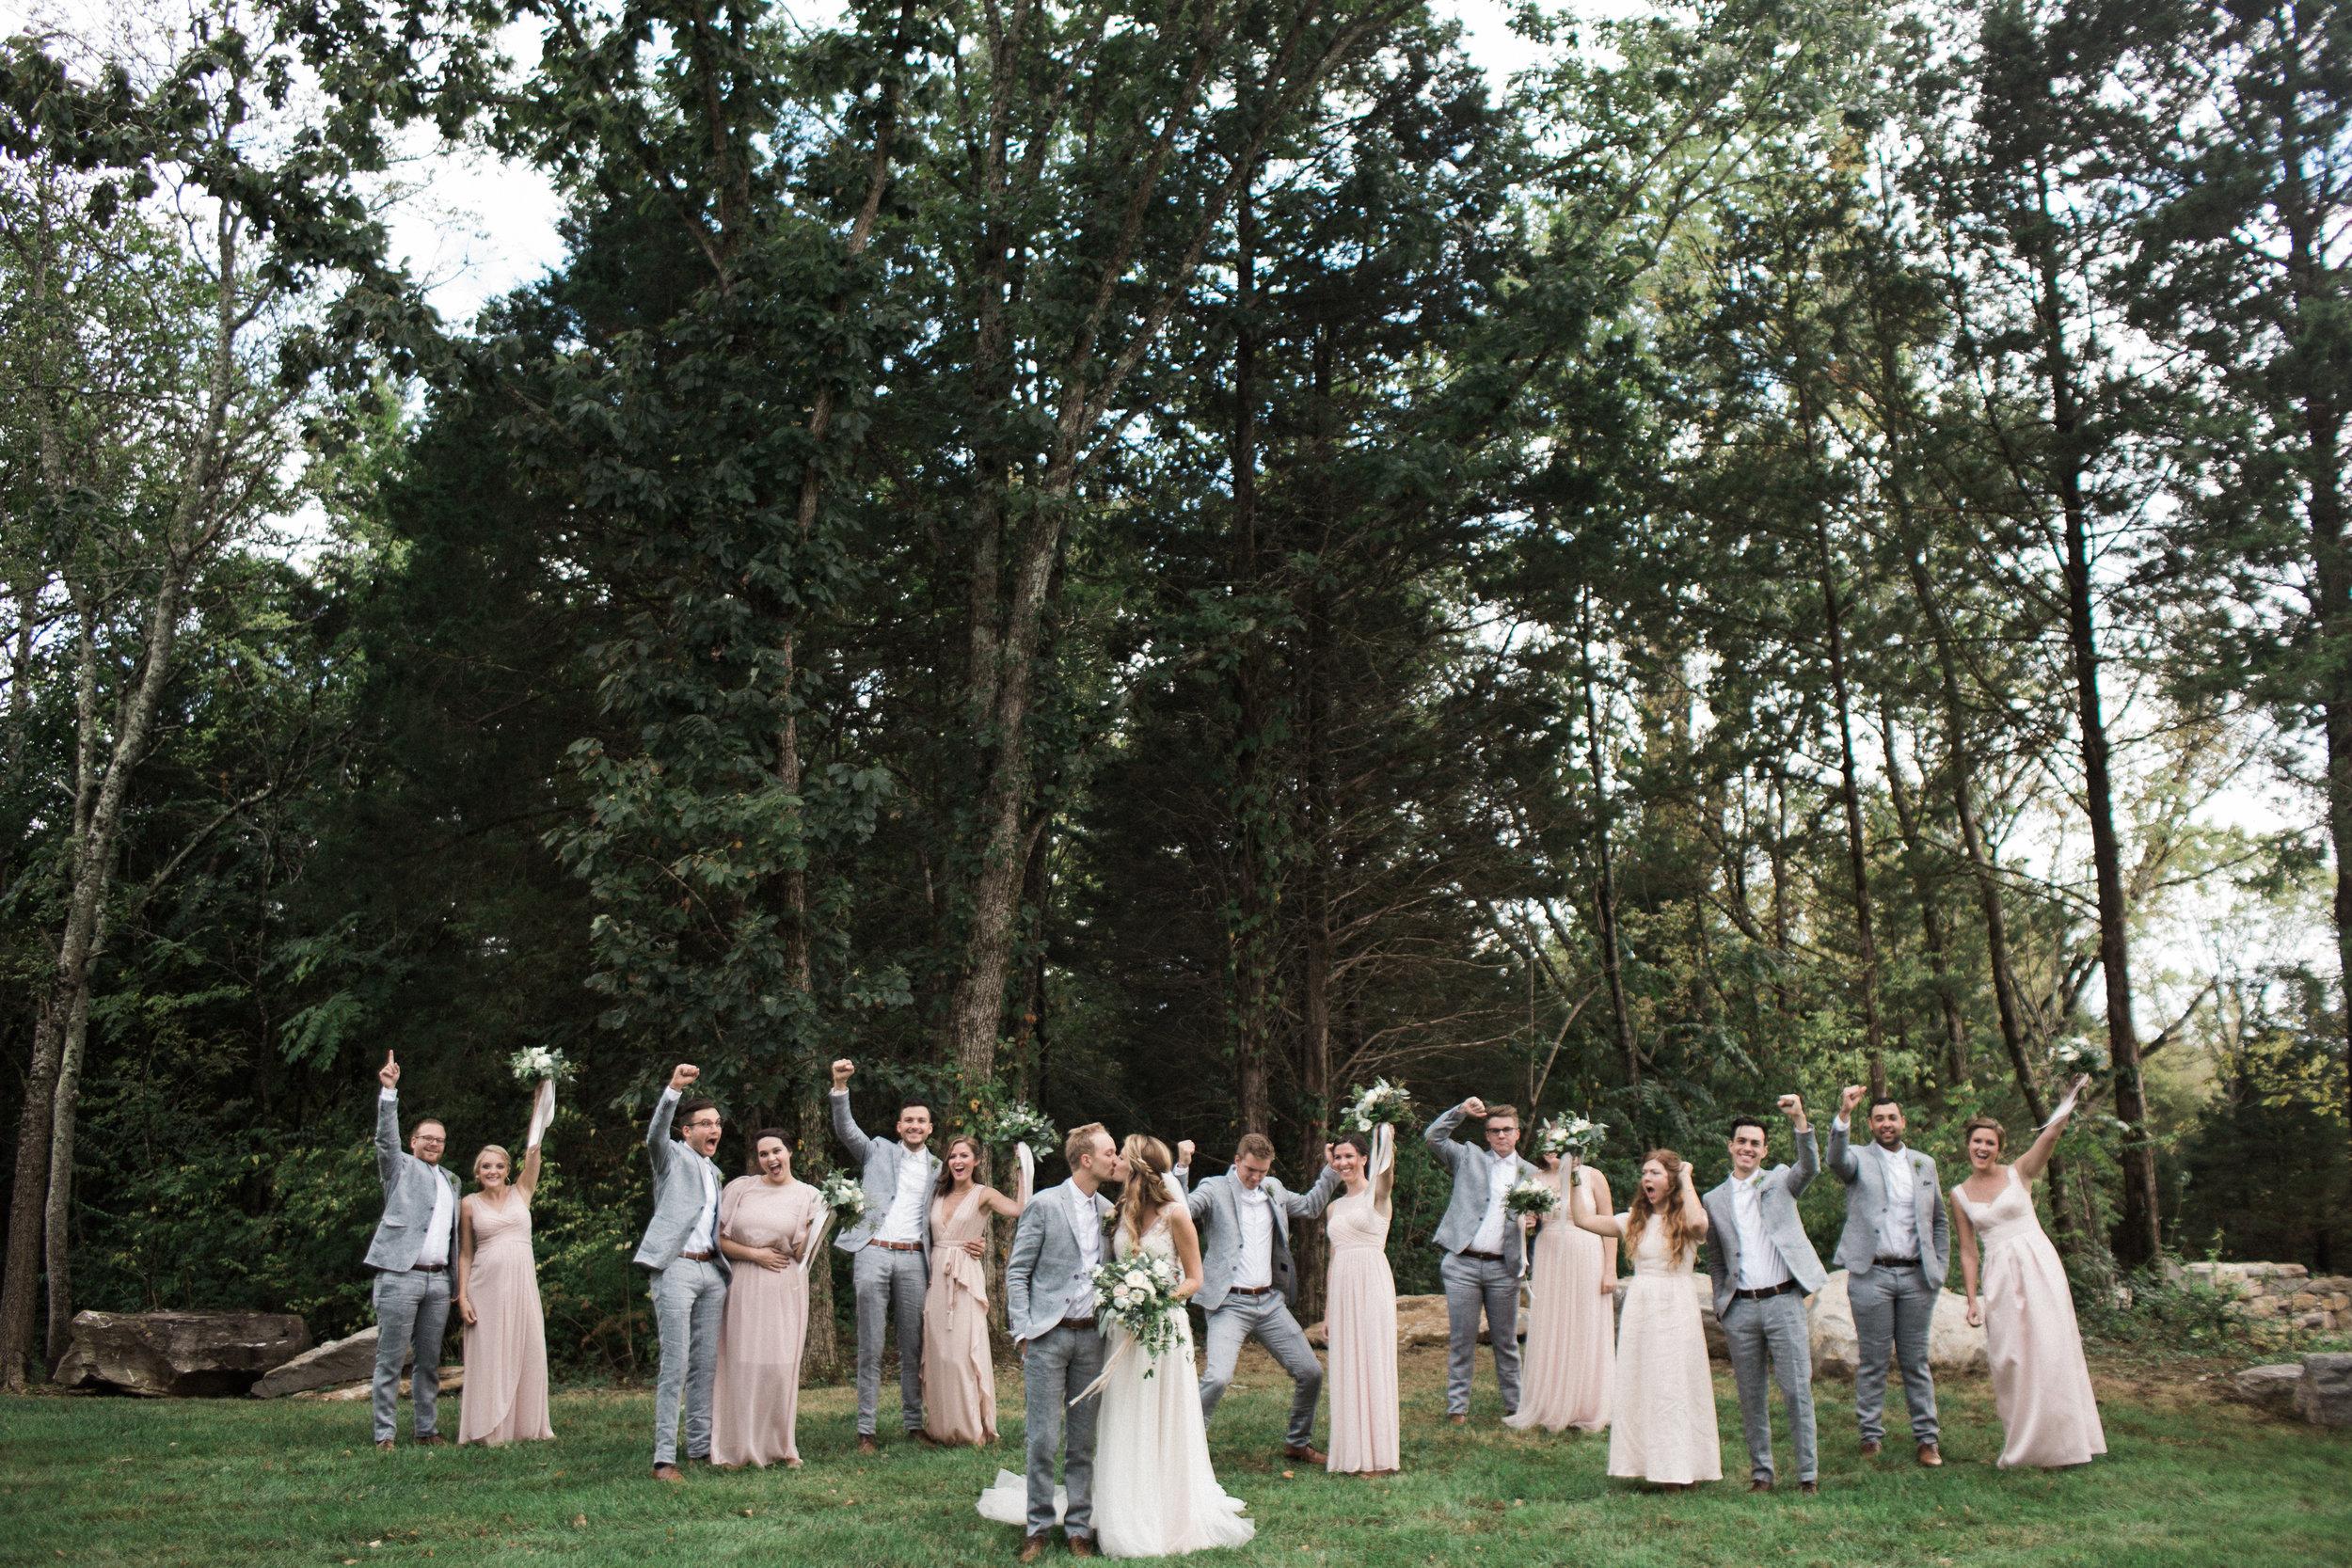 Mikaela Hamilton- Ben & Emily- bridal party-13.jpg